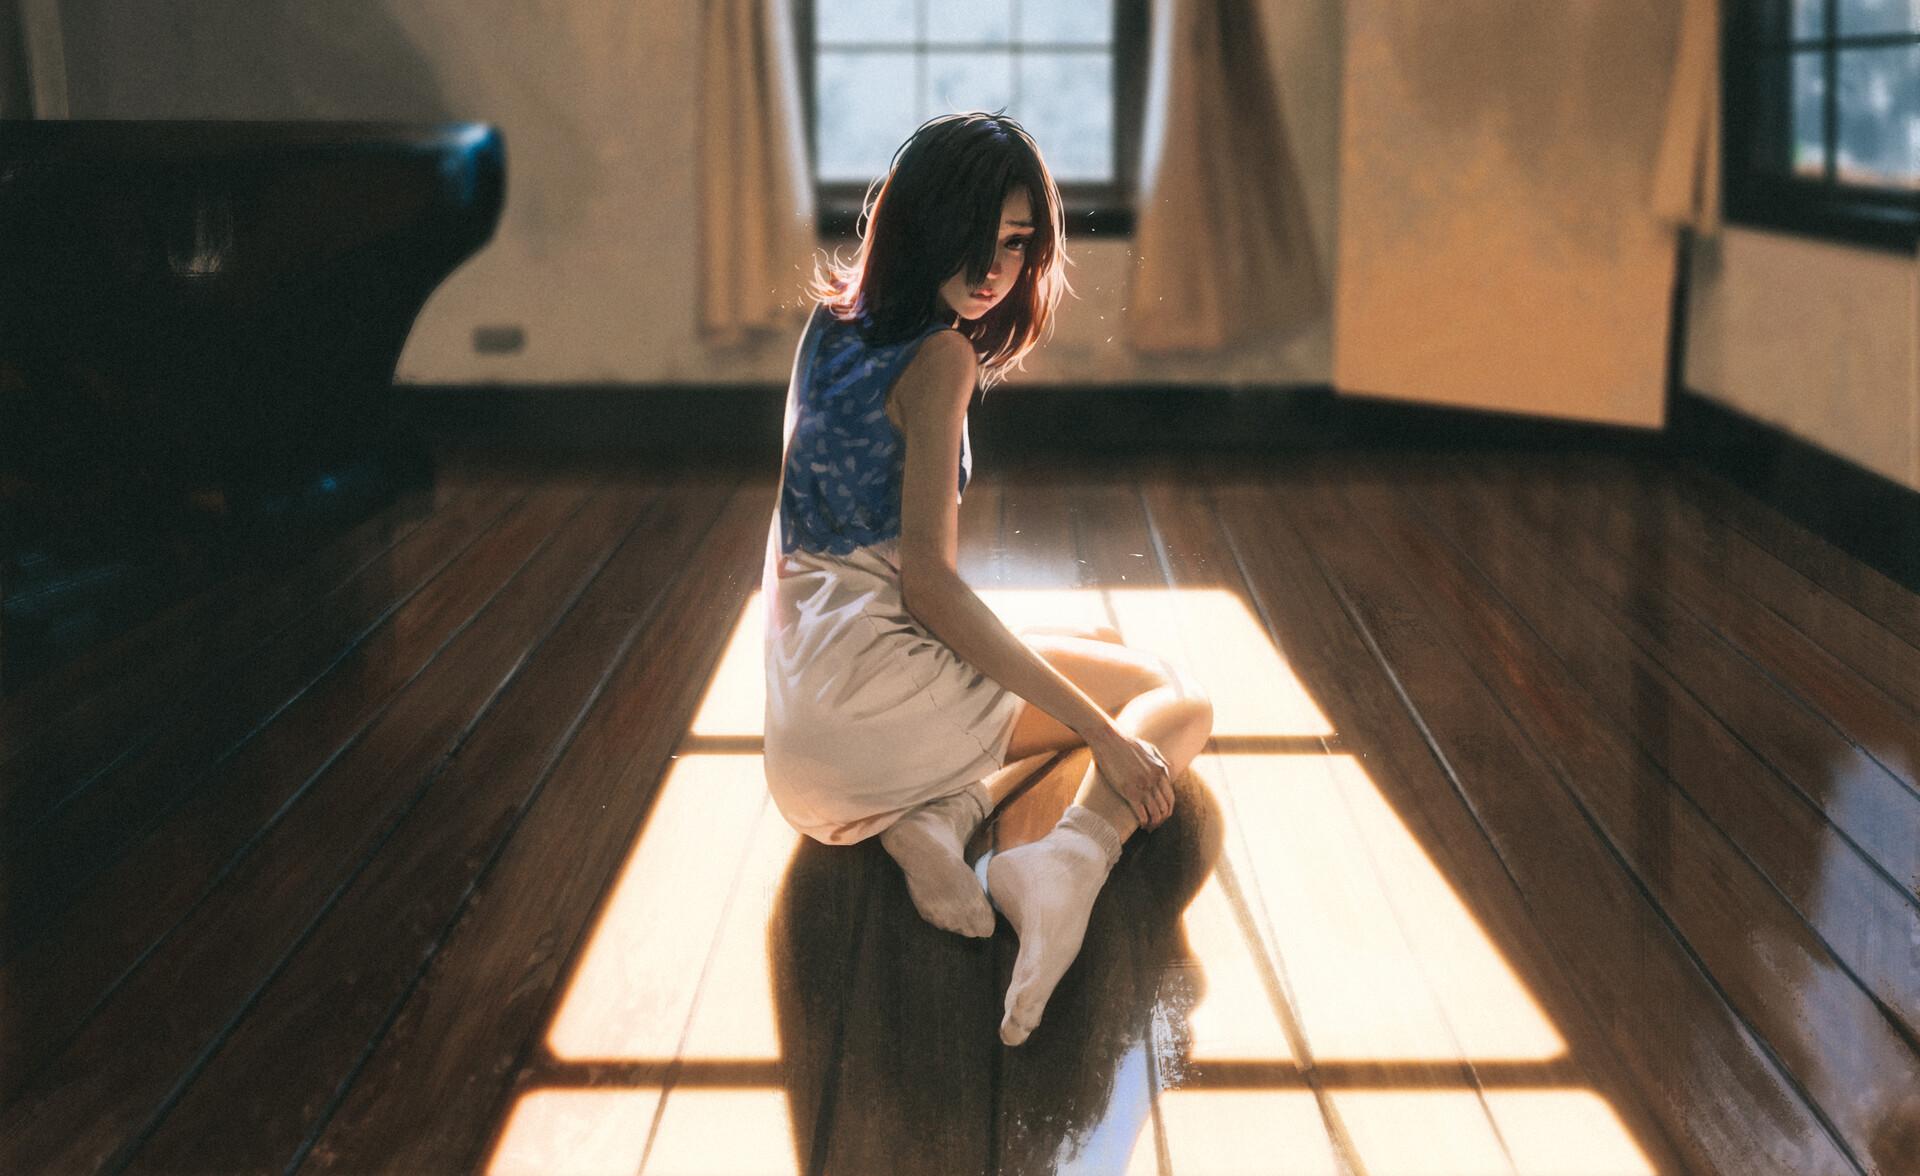 General 1920x1176 Rui Li women window on the floor Sun shadow looking at viewer artwork women indoors socks wooden surface